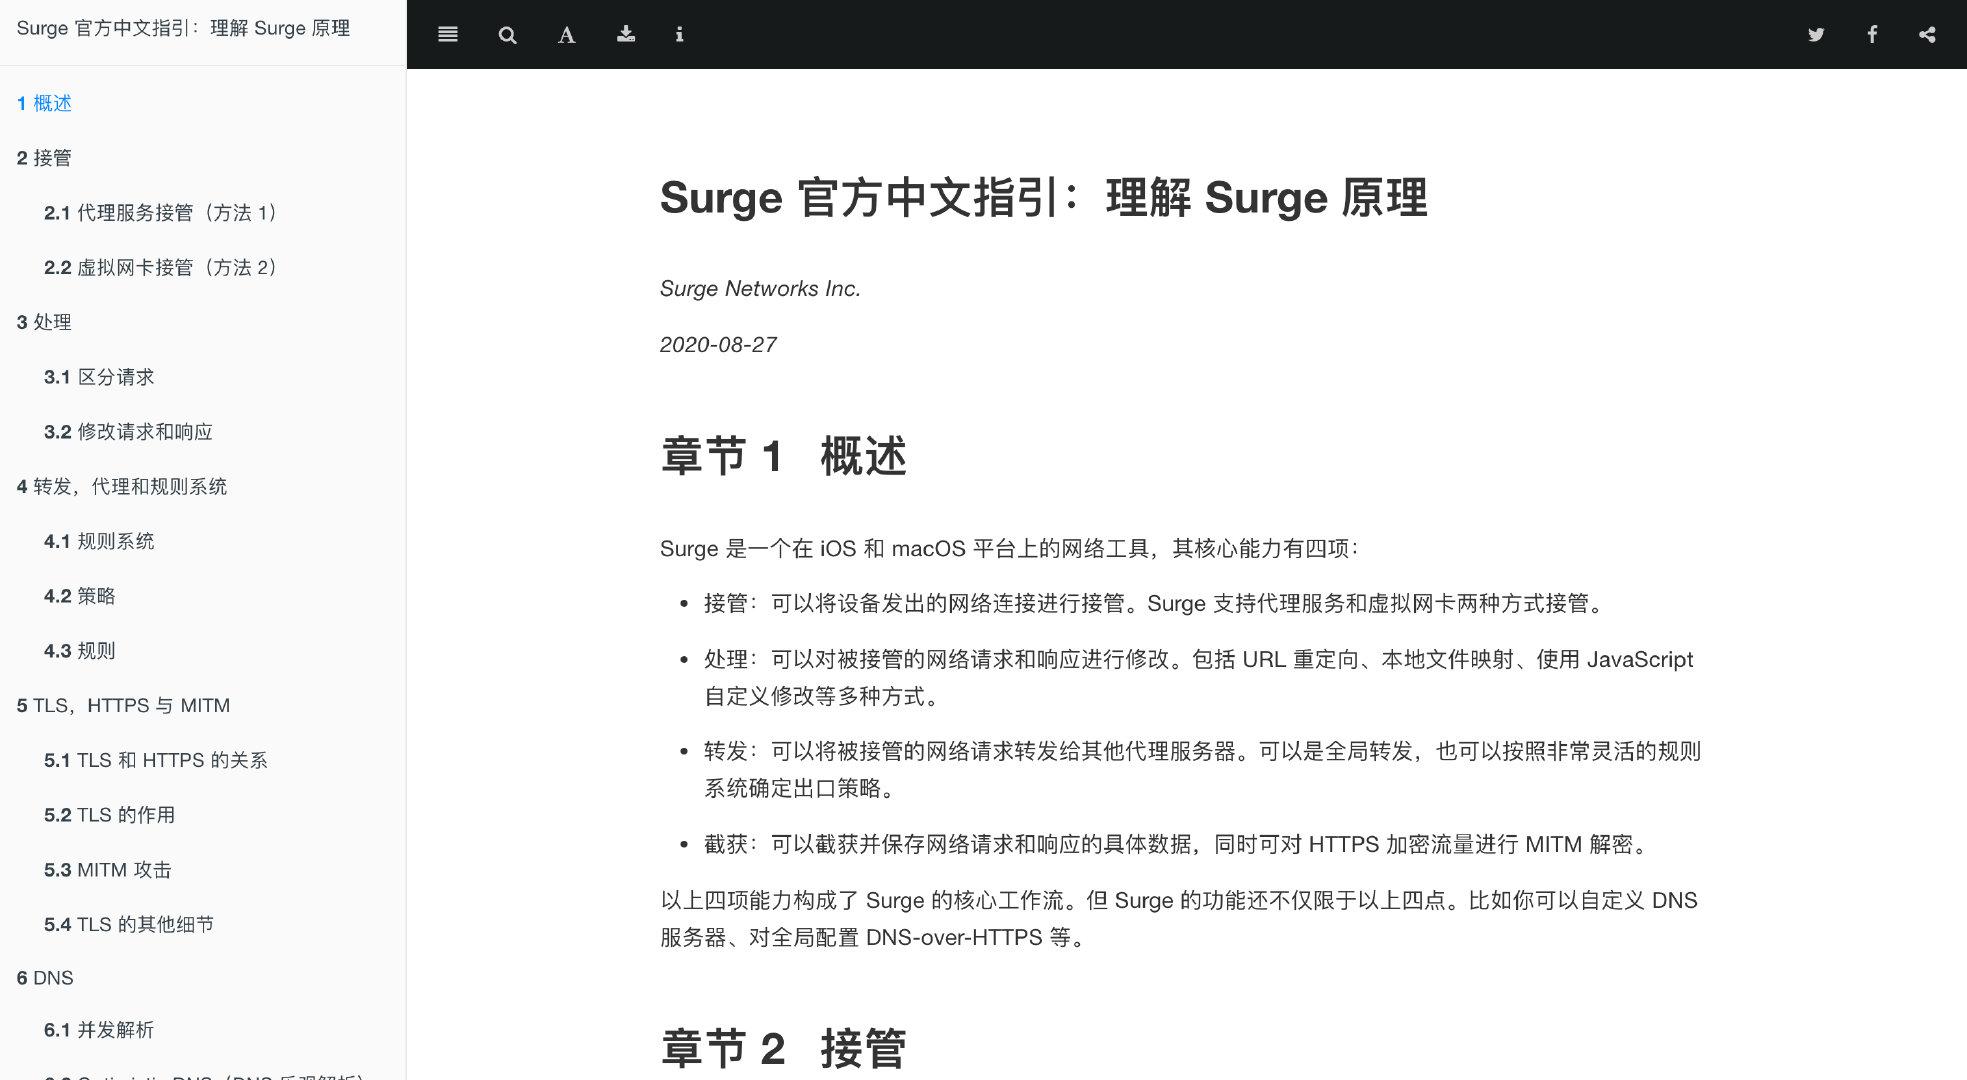 ◎ Surge 官方中文指引